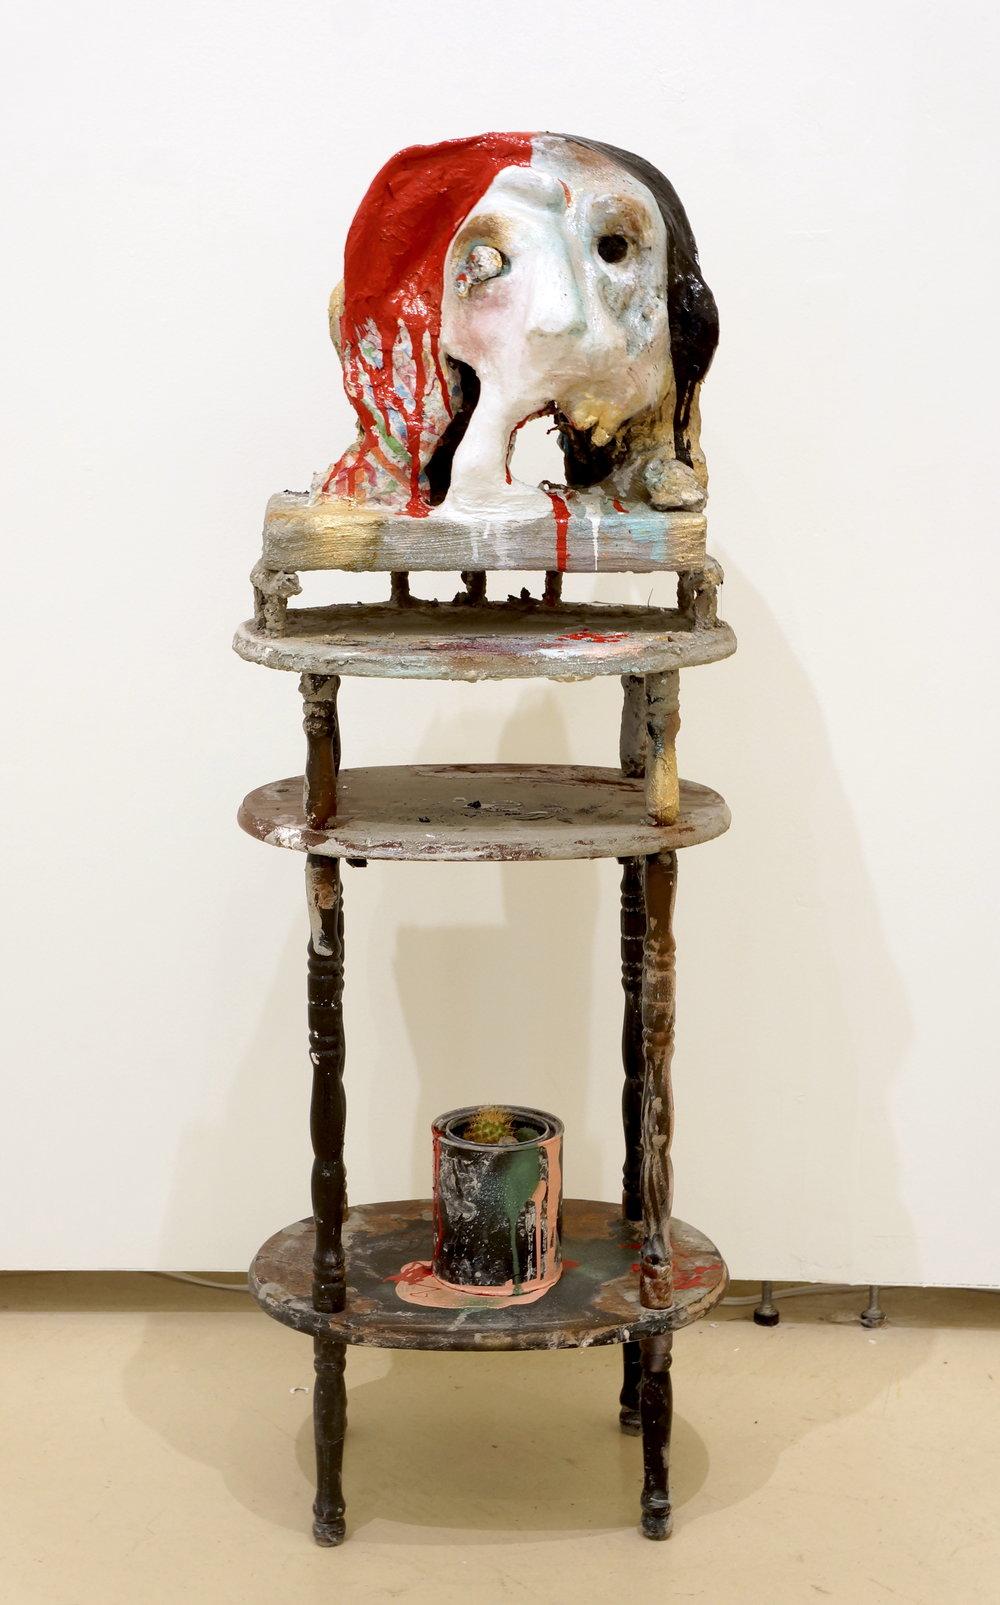 Jacqueline Cingolani  Untitled,  2018 mixed media 44 ½ x 16 x 12 in.